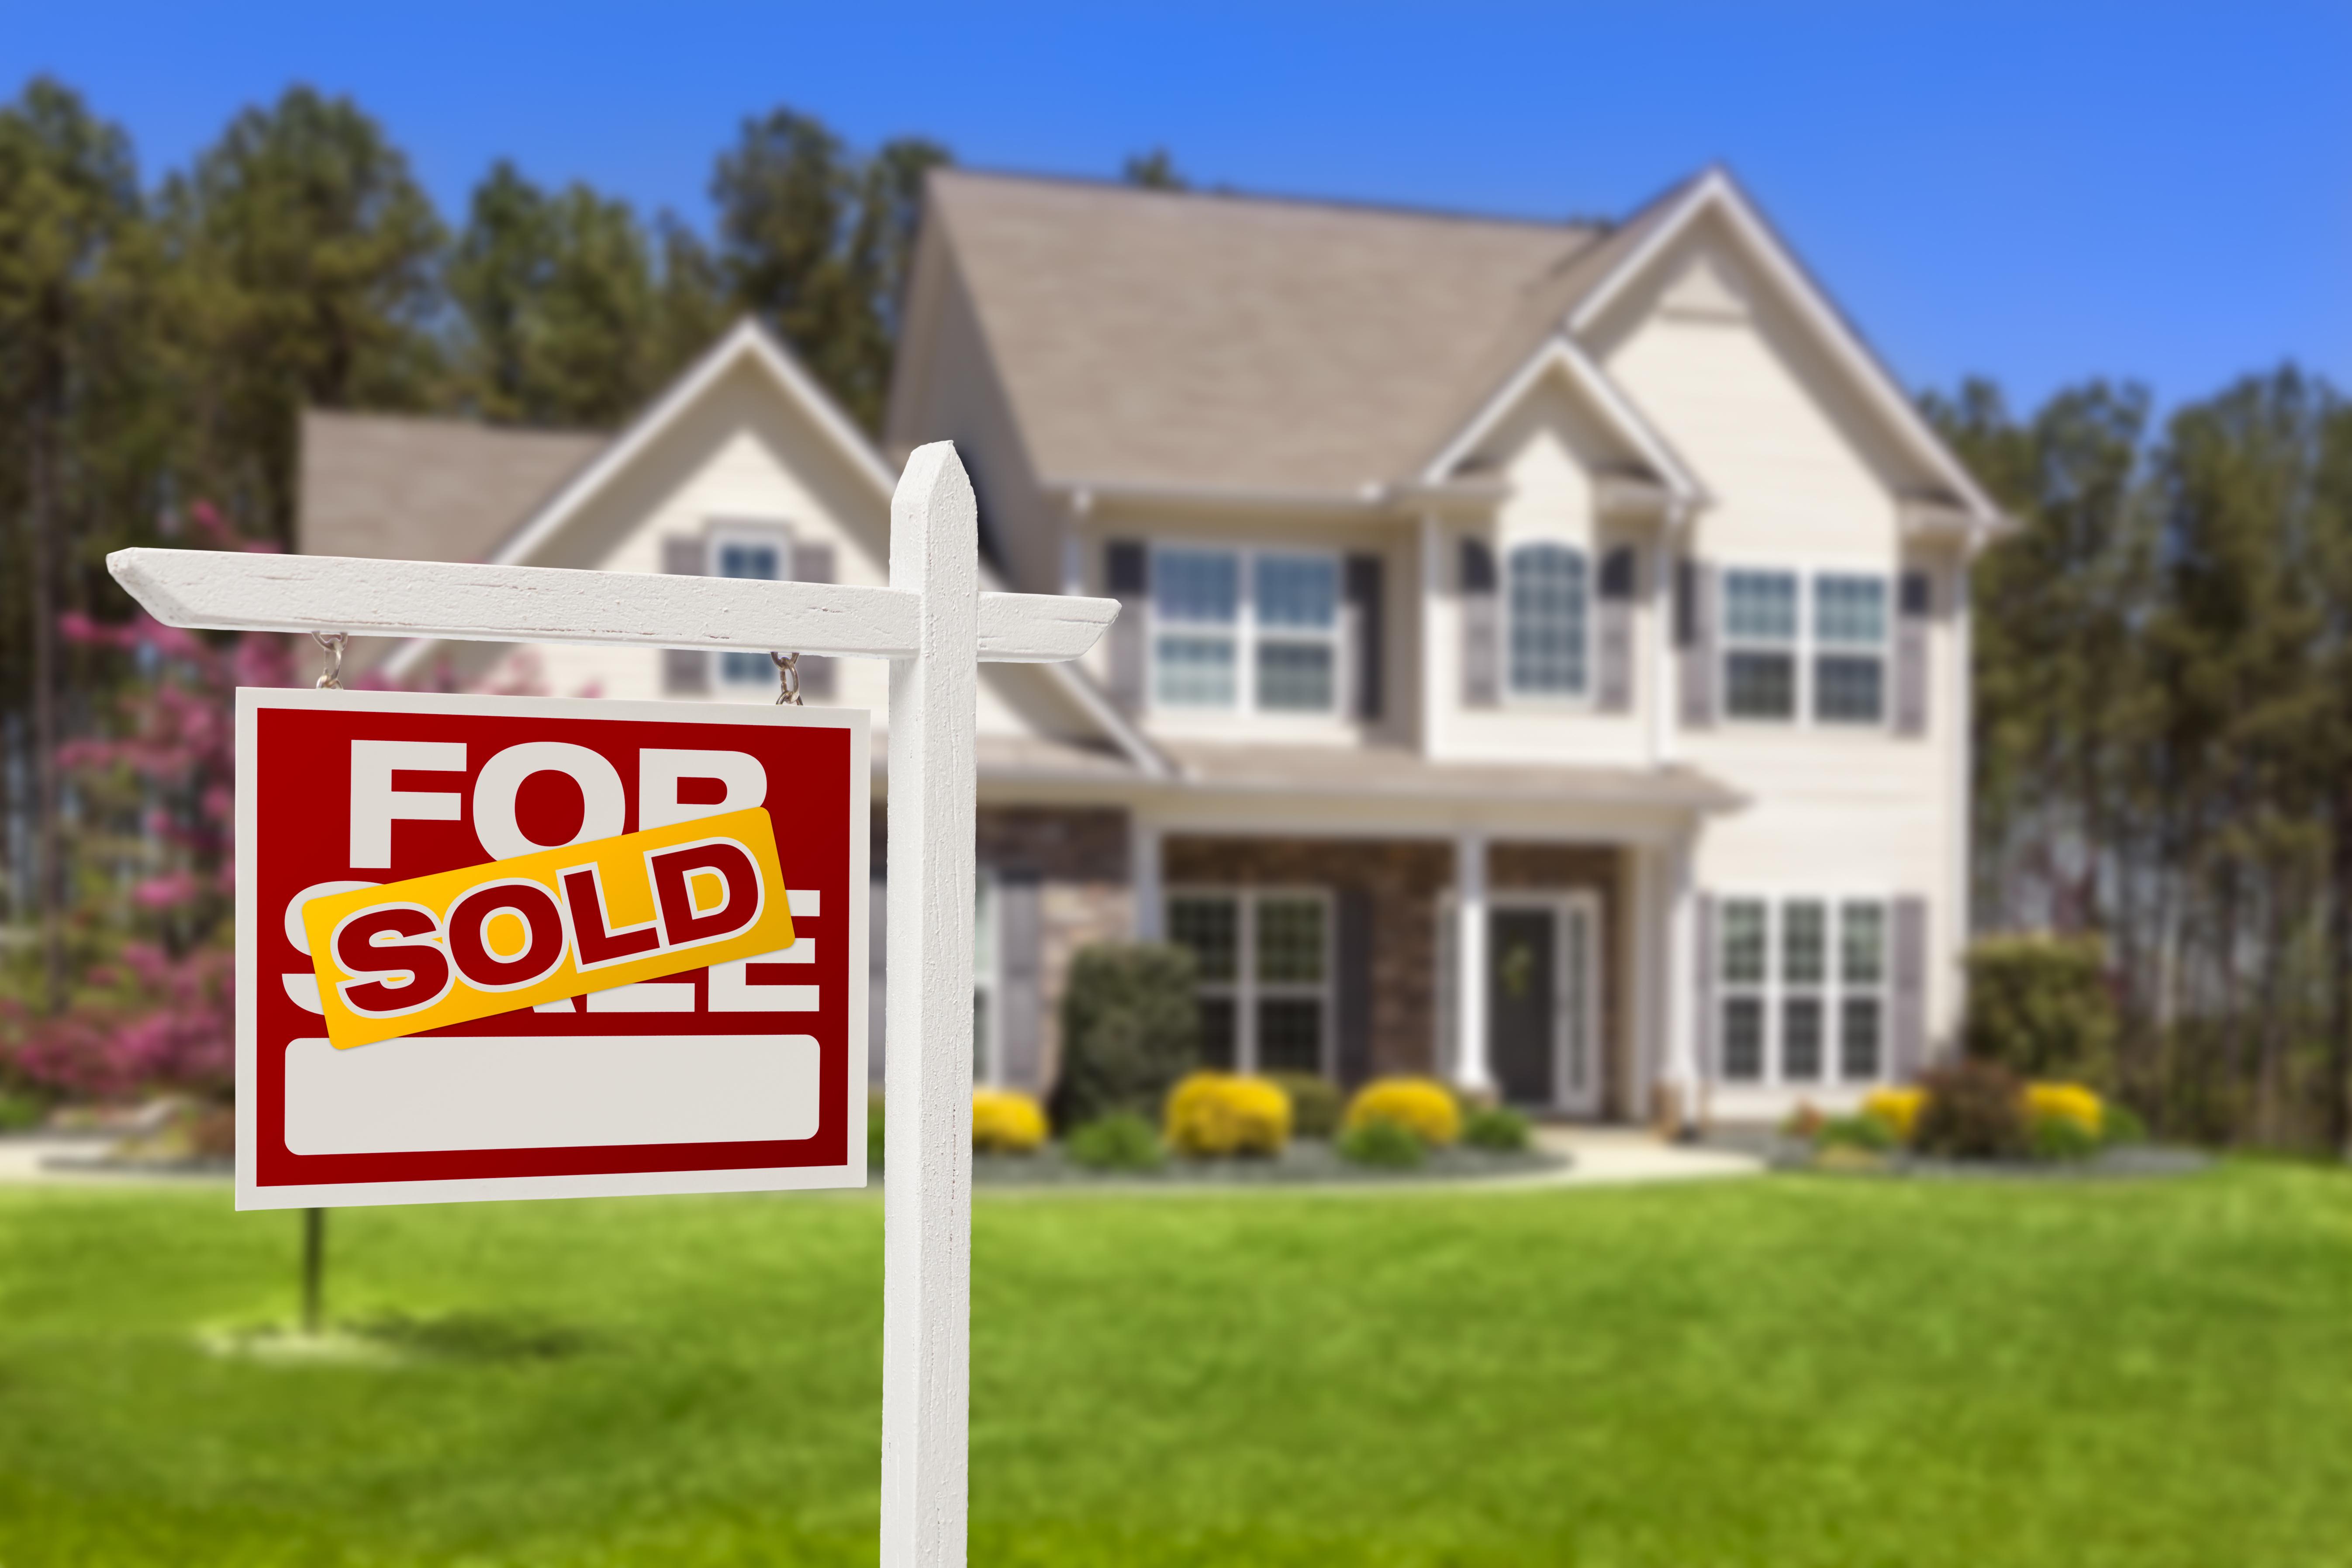 Homes For Sale in Draper, Utah